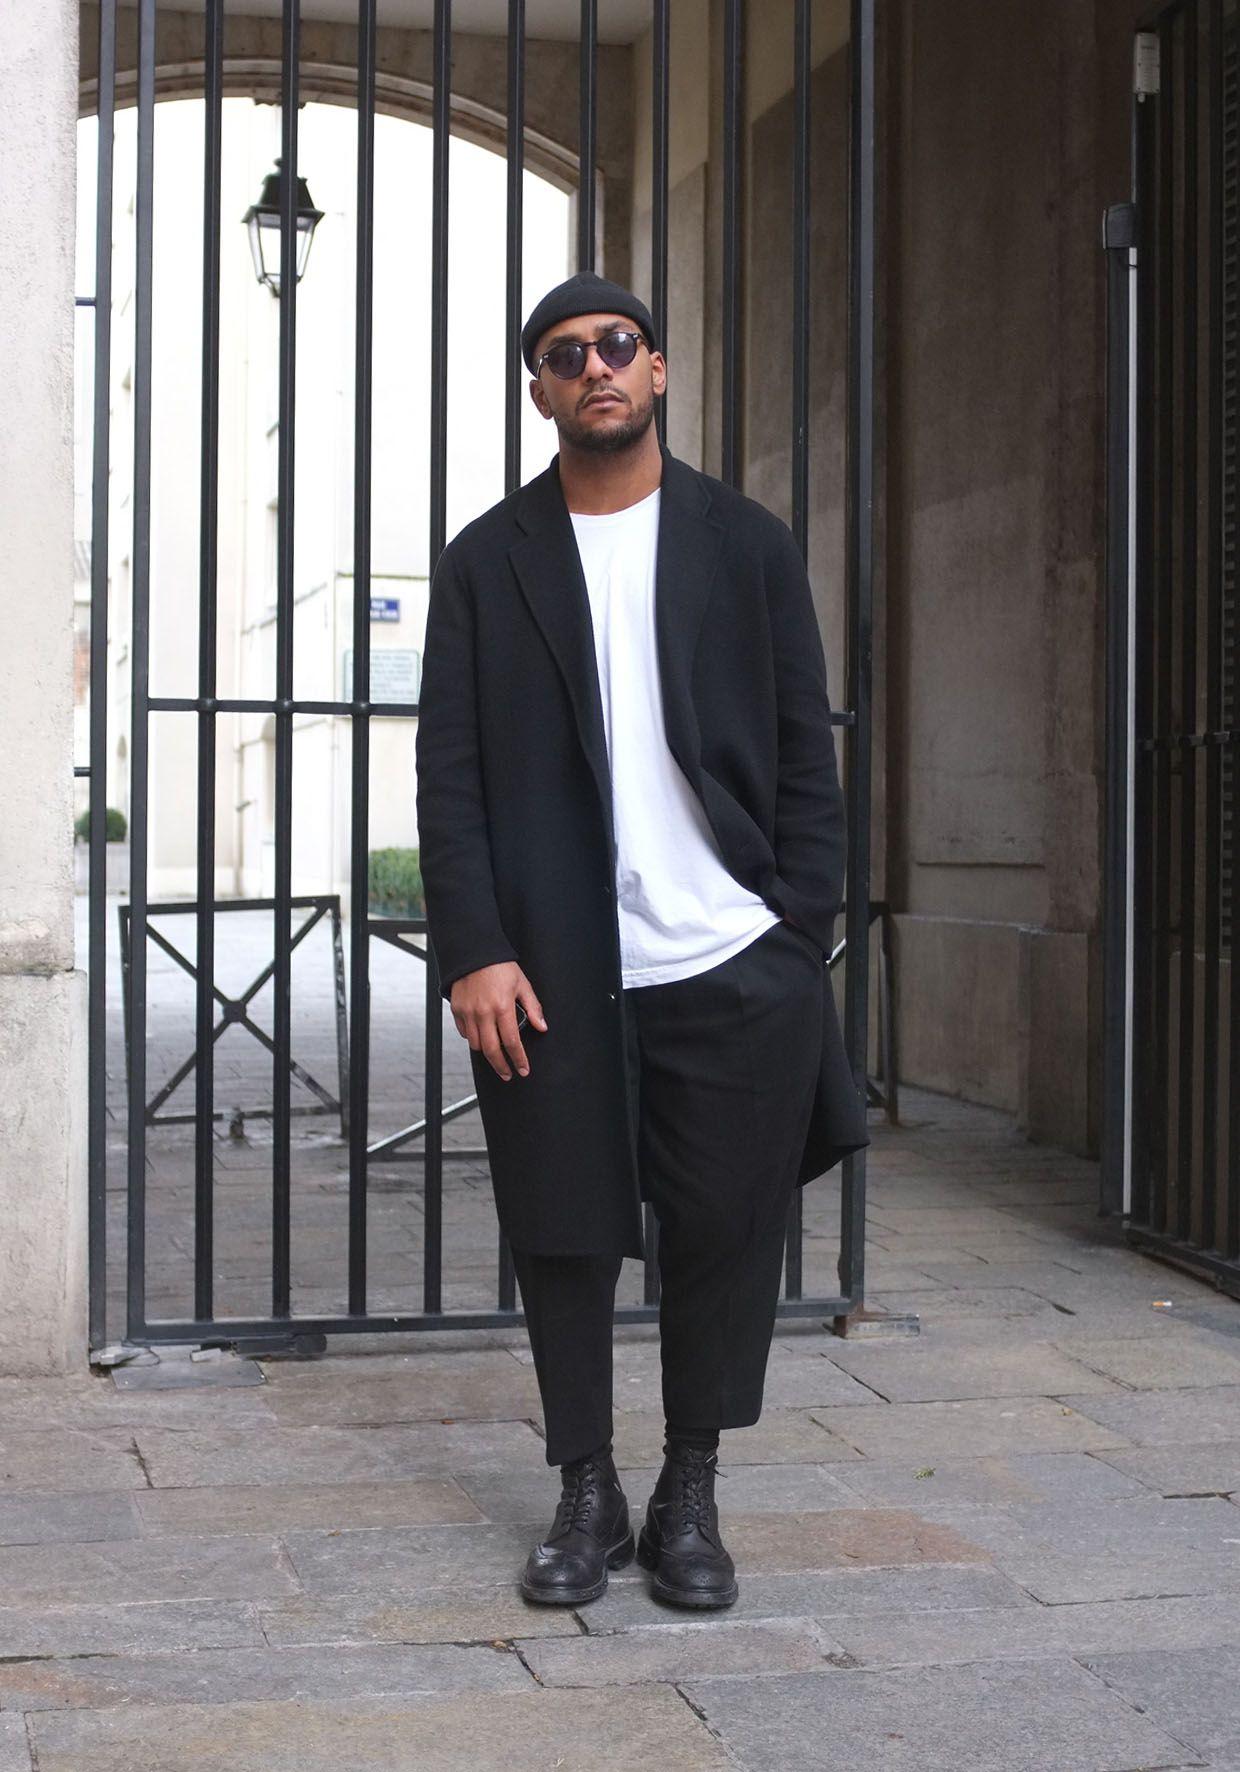 7b3c9fe2275 MenStyle1- Men s Style Blog - Les Freres Joachim. FOLLOW   Guidomaggi Shoes.